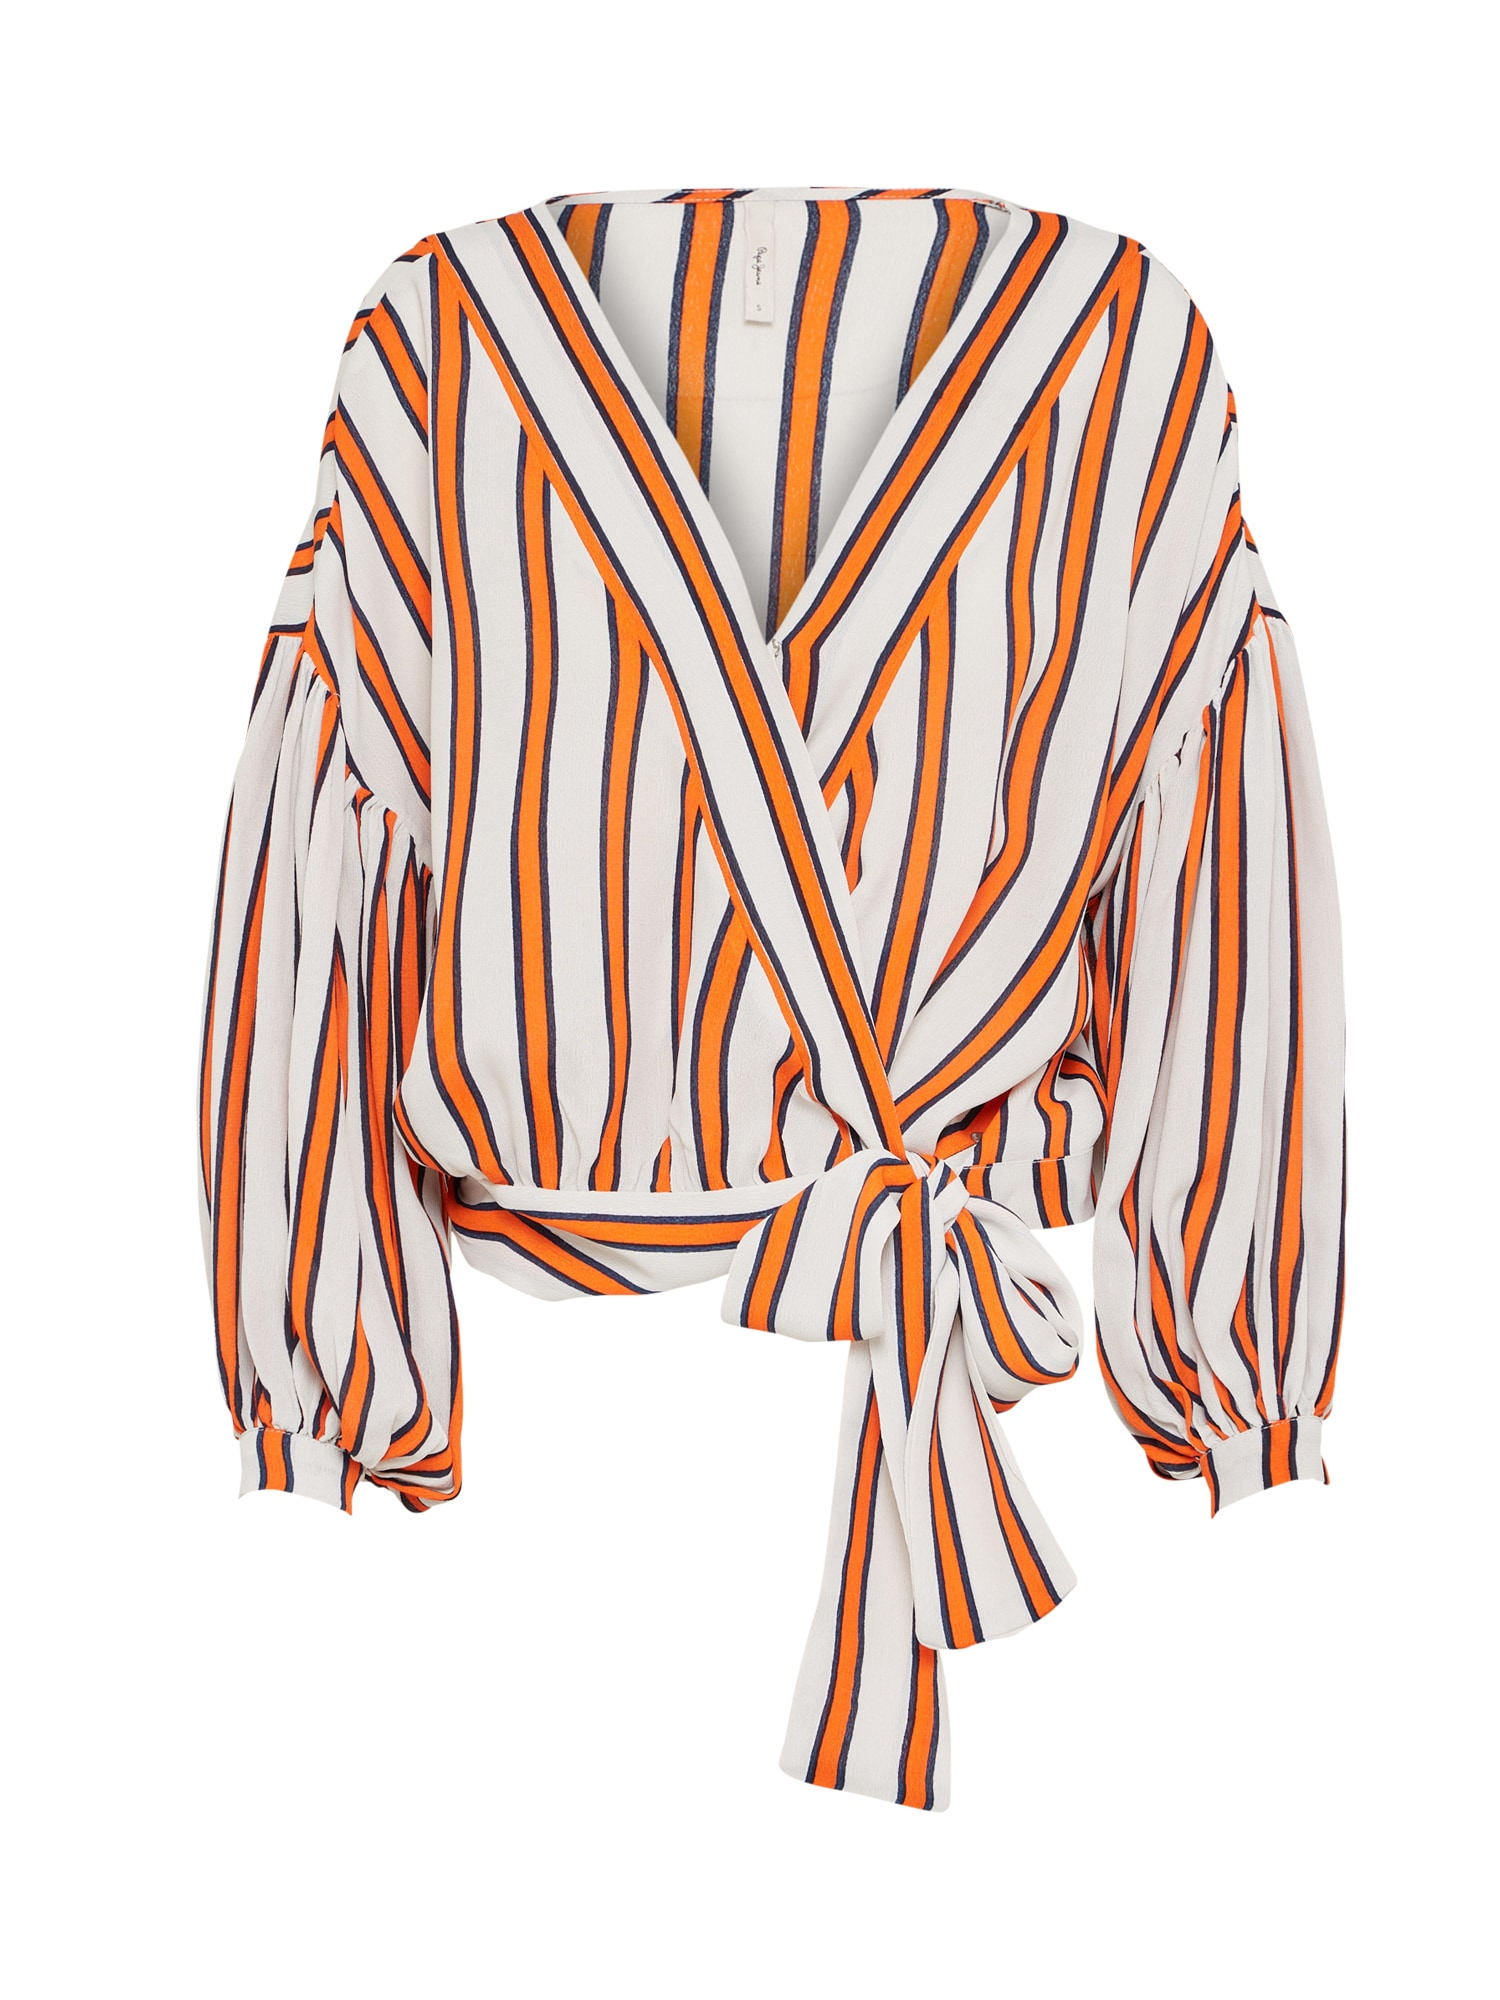 Pepe Jeans Dames Blouse AUDREY grijs sinaasappel